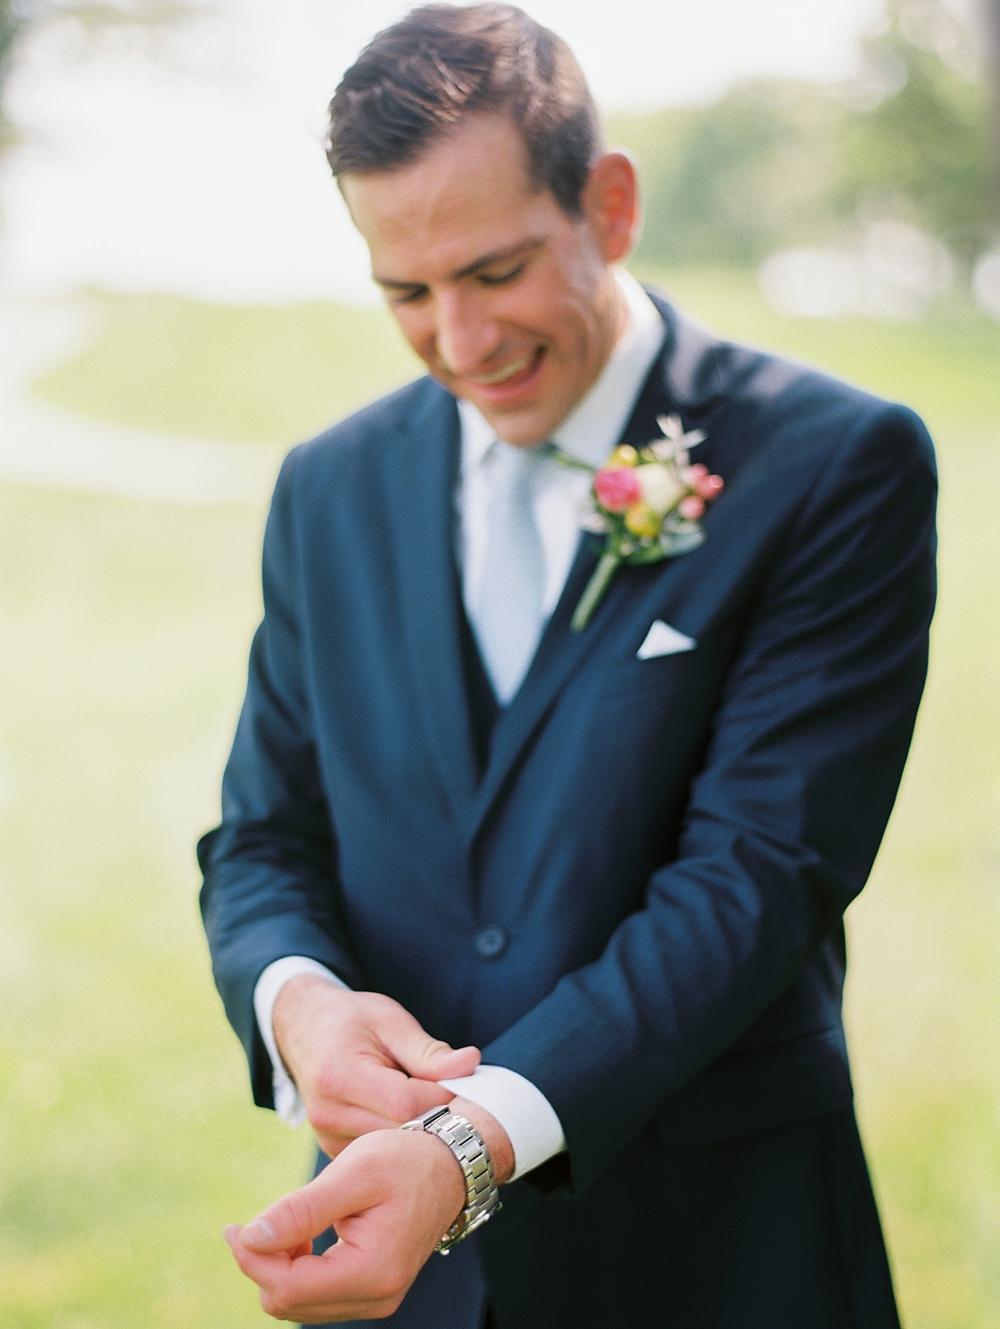 kristin-la-voie-photography-butterfield-country-club-best-chicago-austin-wedding-fine-art-photographer-121